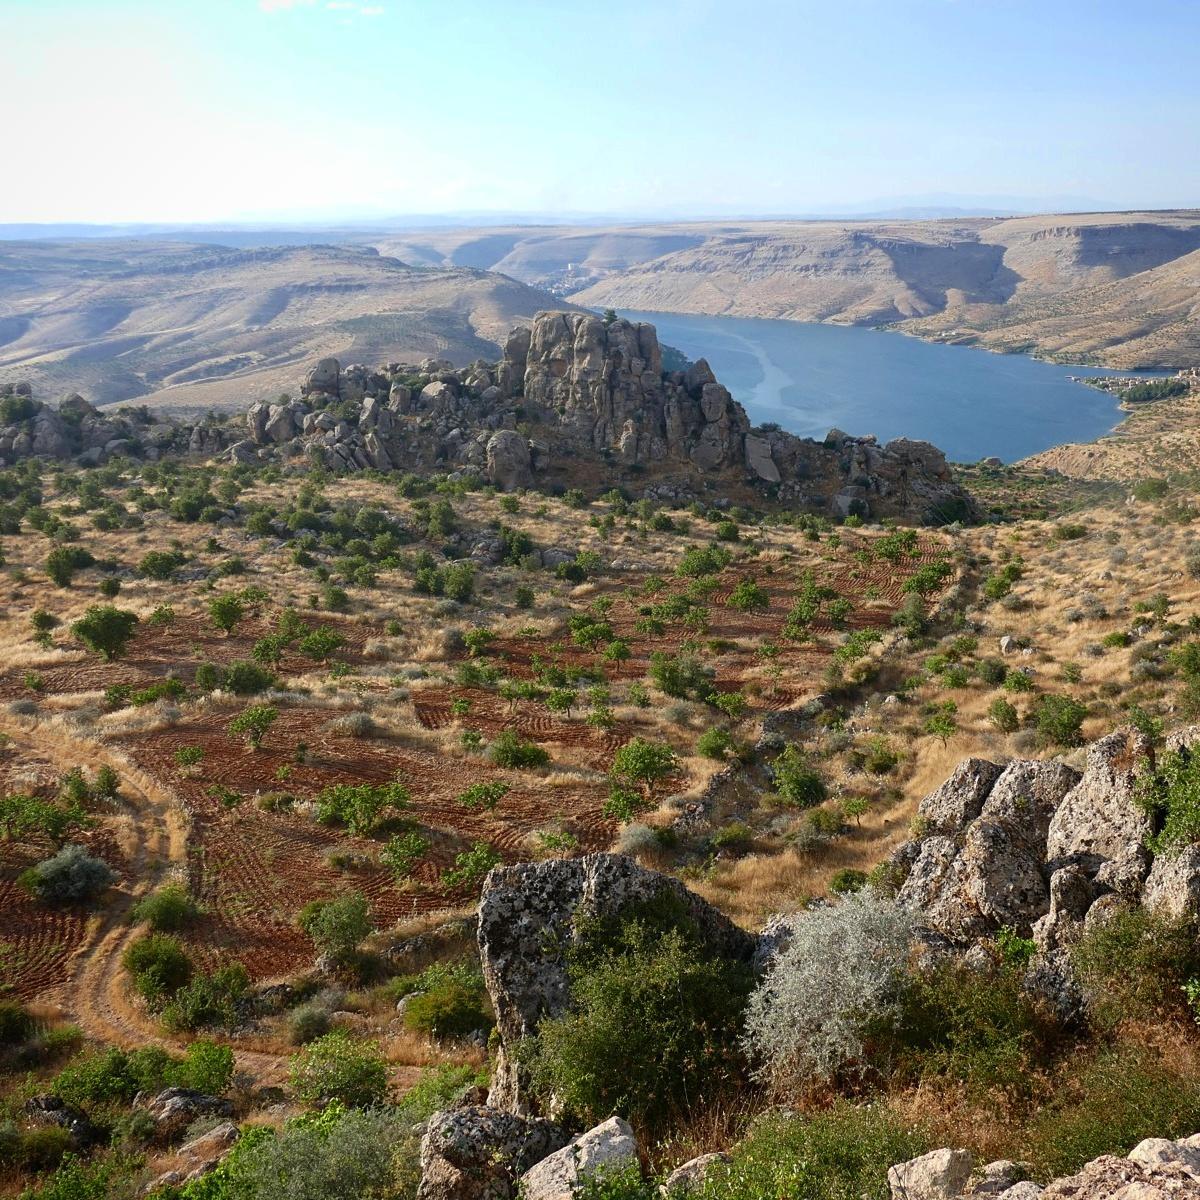 The Euphrates River winds between castle-like rock formations in southern Turkey. Noah Strycker